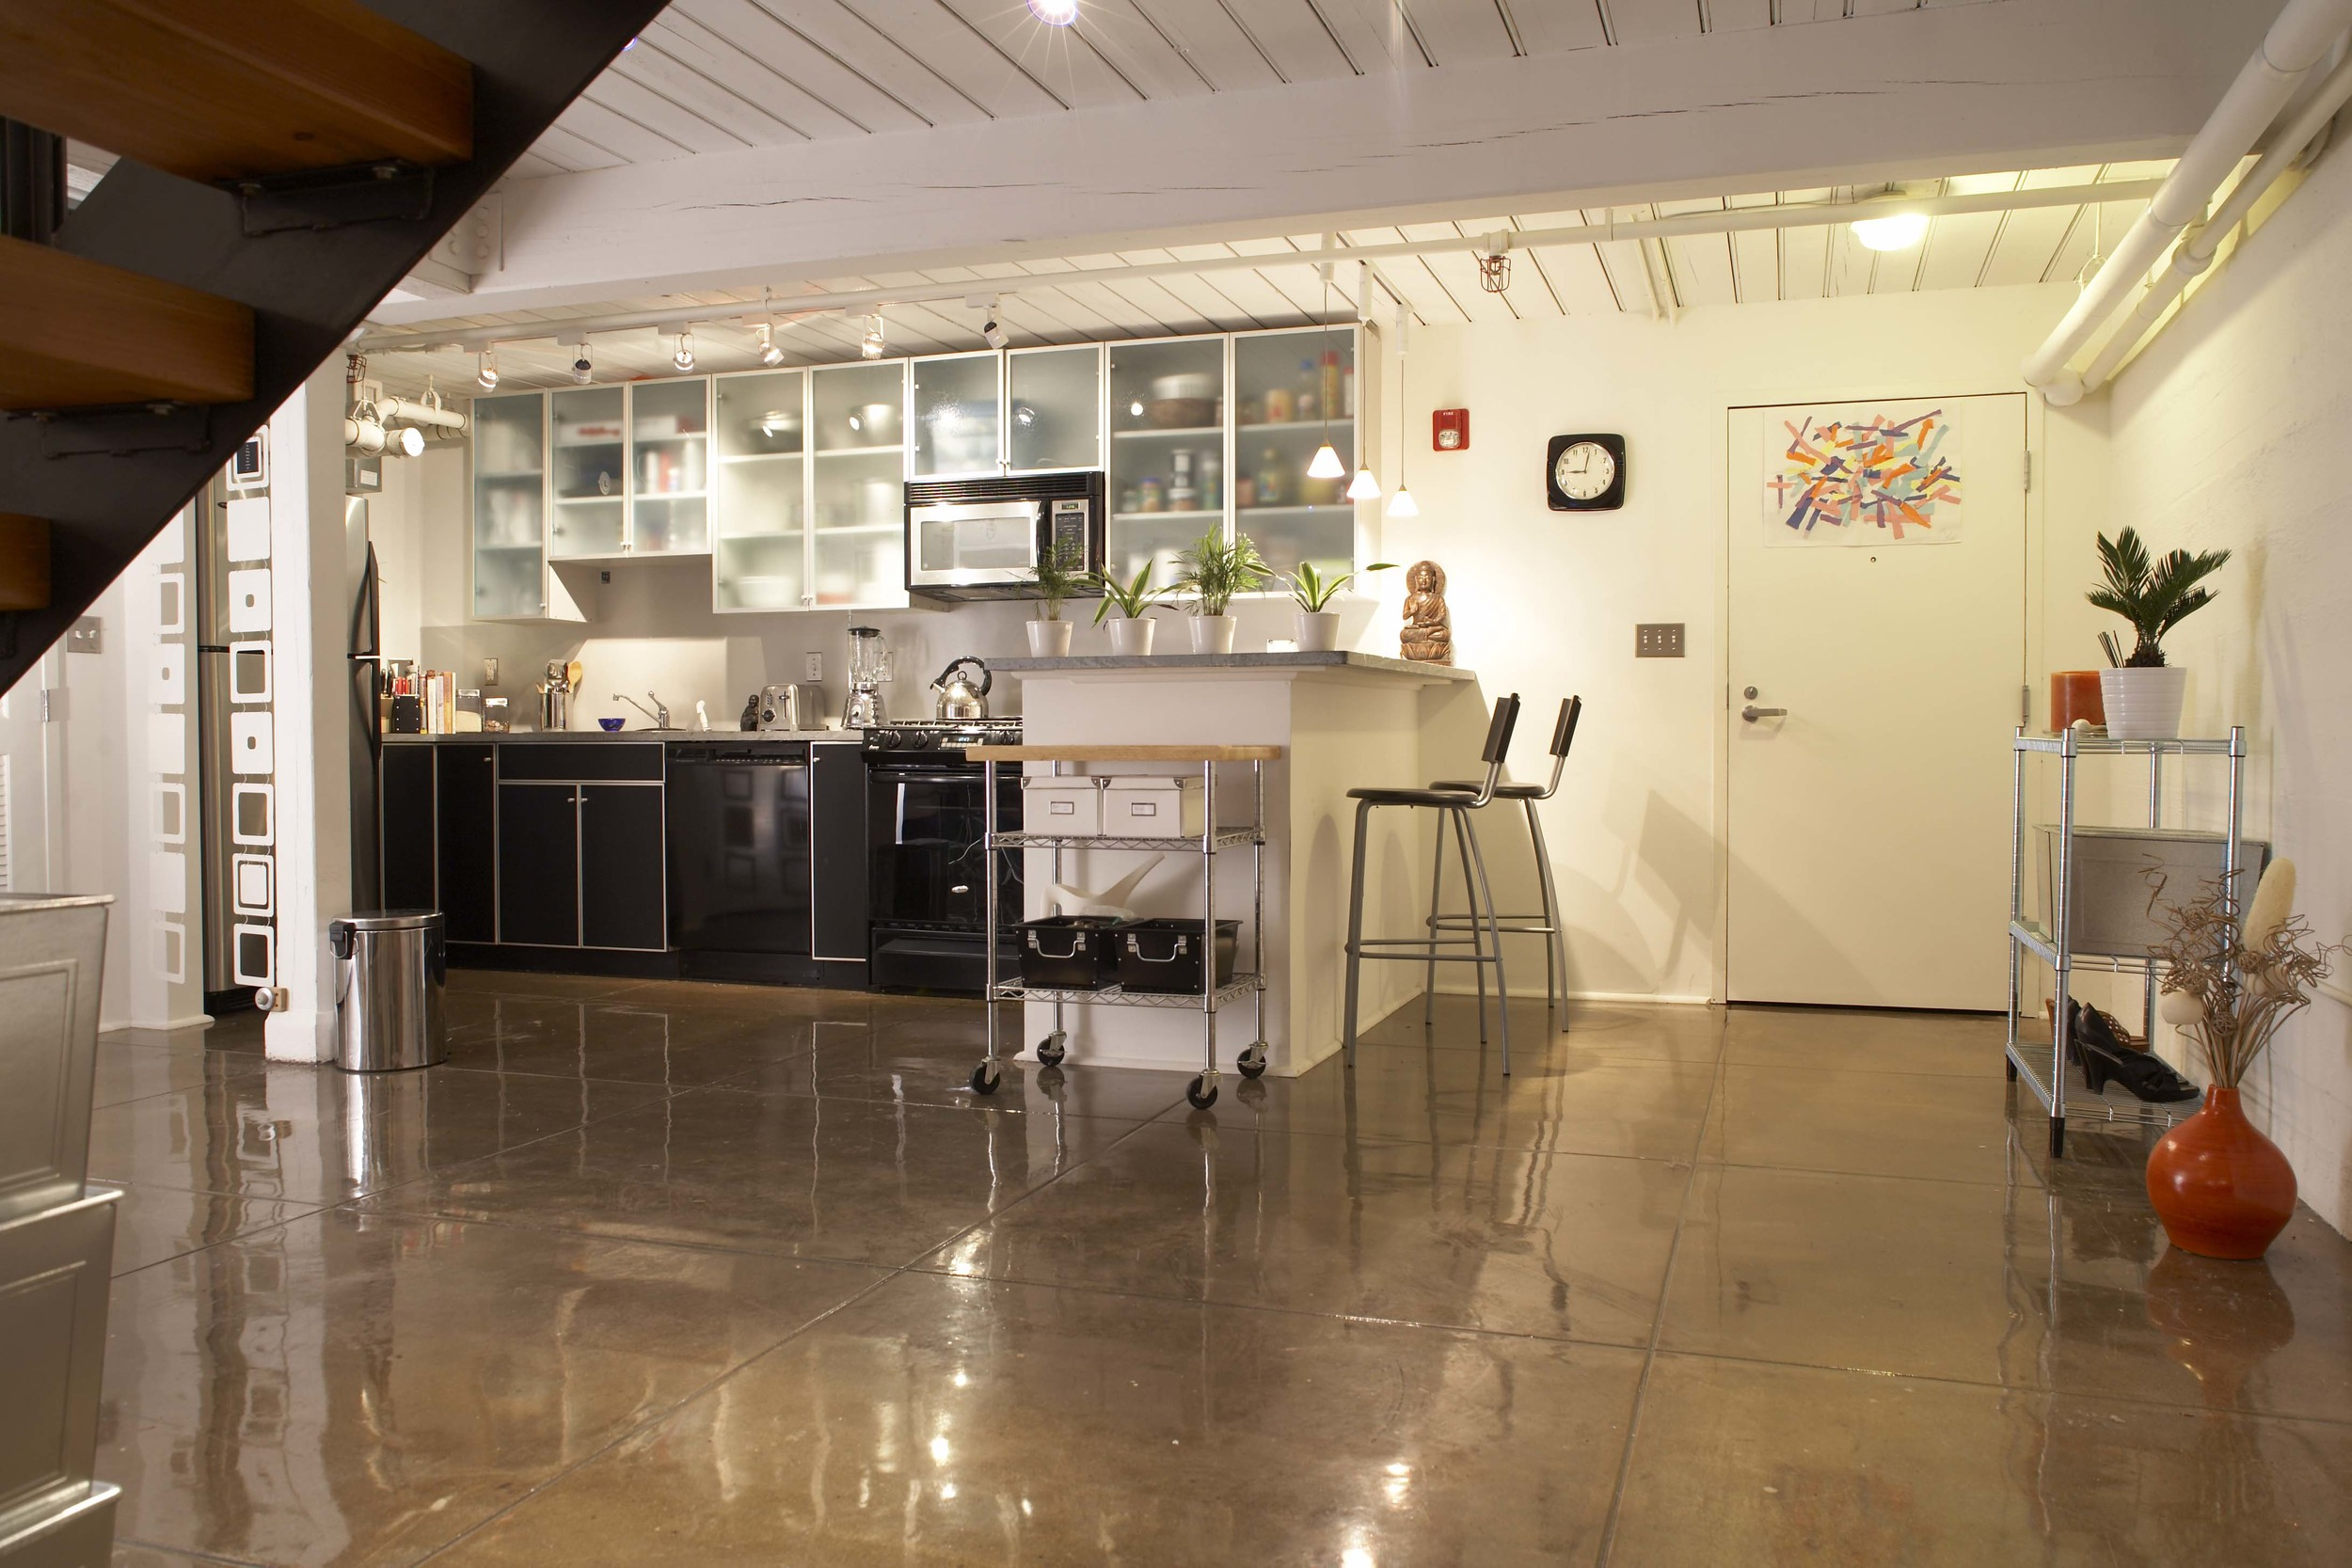 herman miller desk chairs all weather wicker rocking pawtucket residential loft — alison bologna design